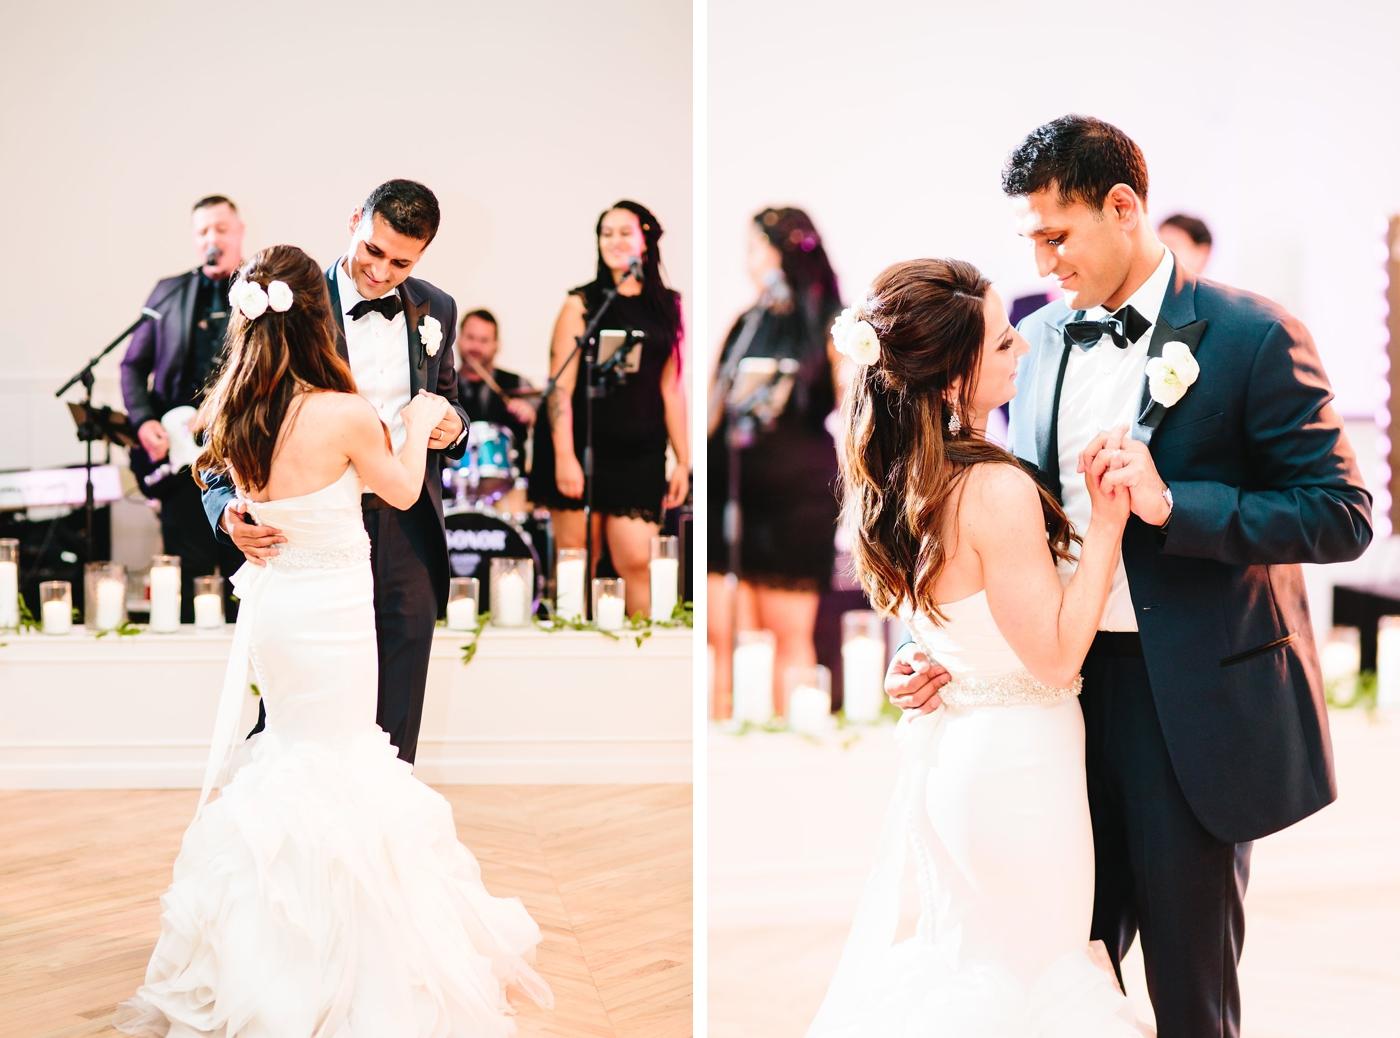 chicago-fine-art-wedding-photography-sakamuri90